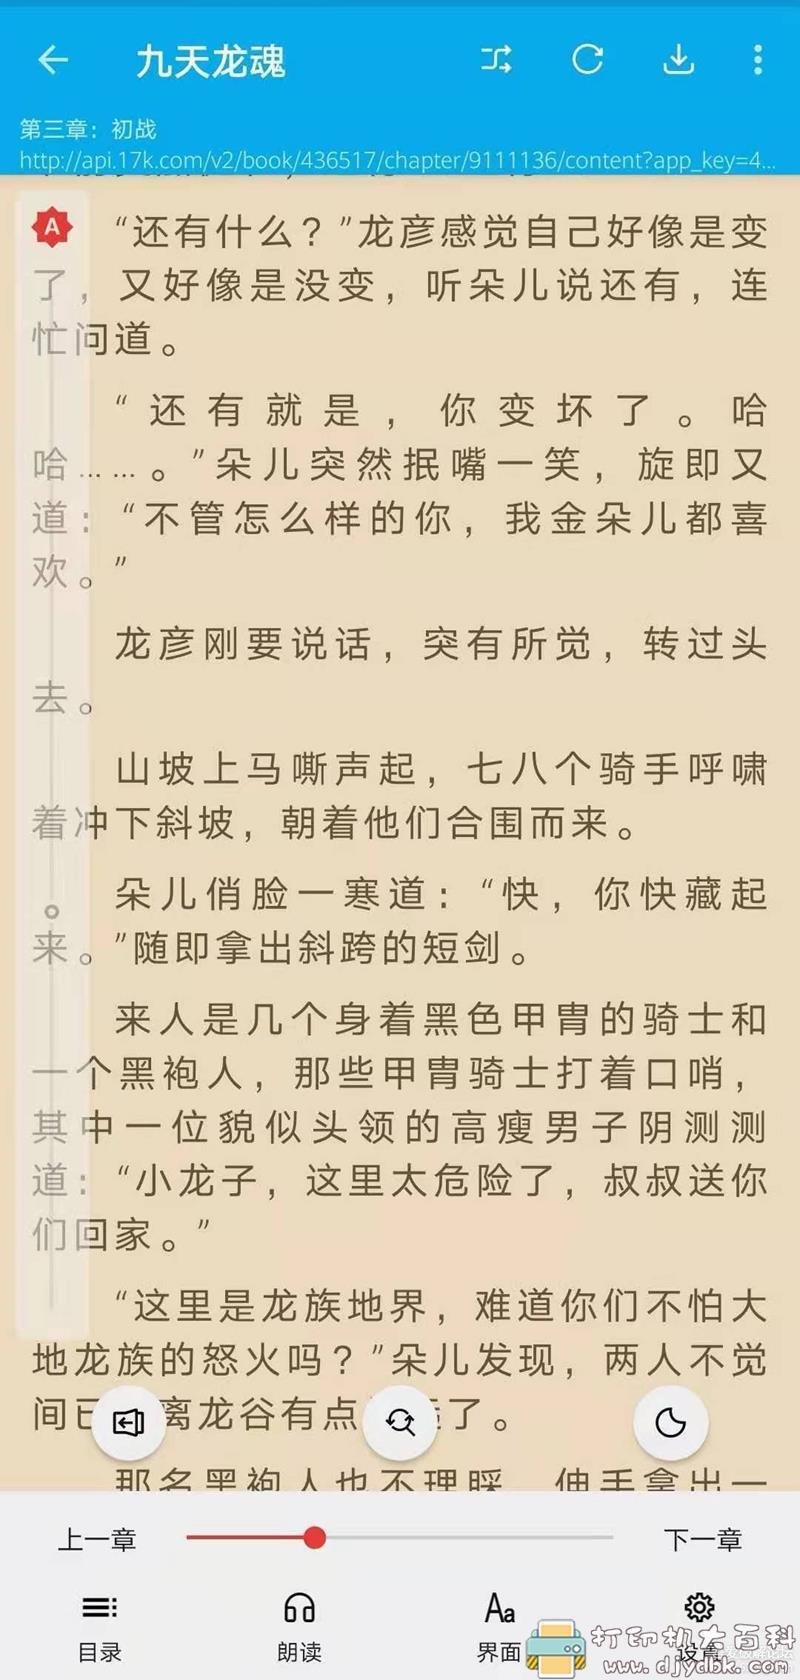 [Android]免费小说软件:爱上看书V1.7 配图 No.4